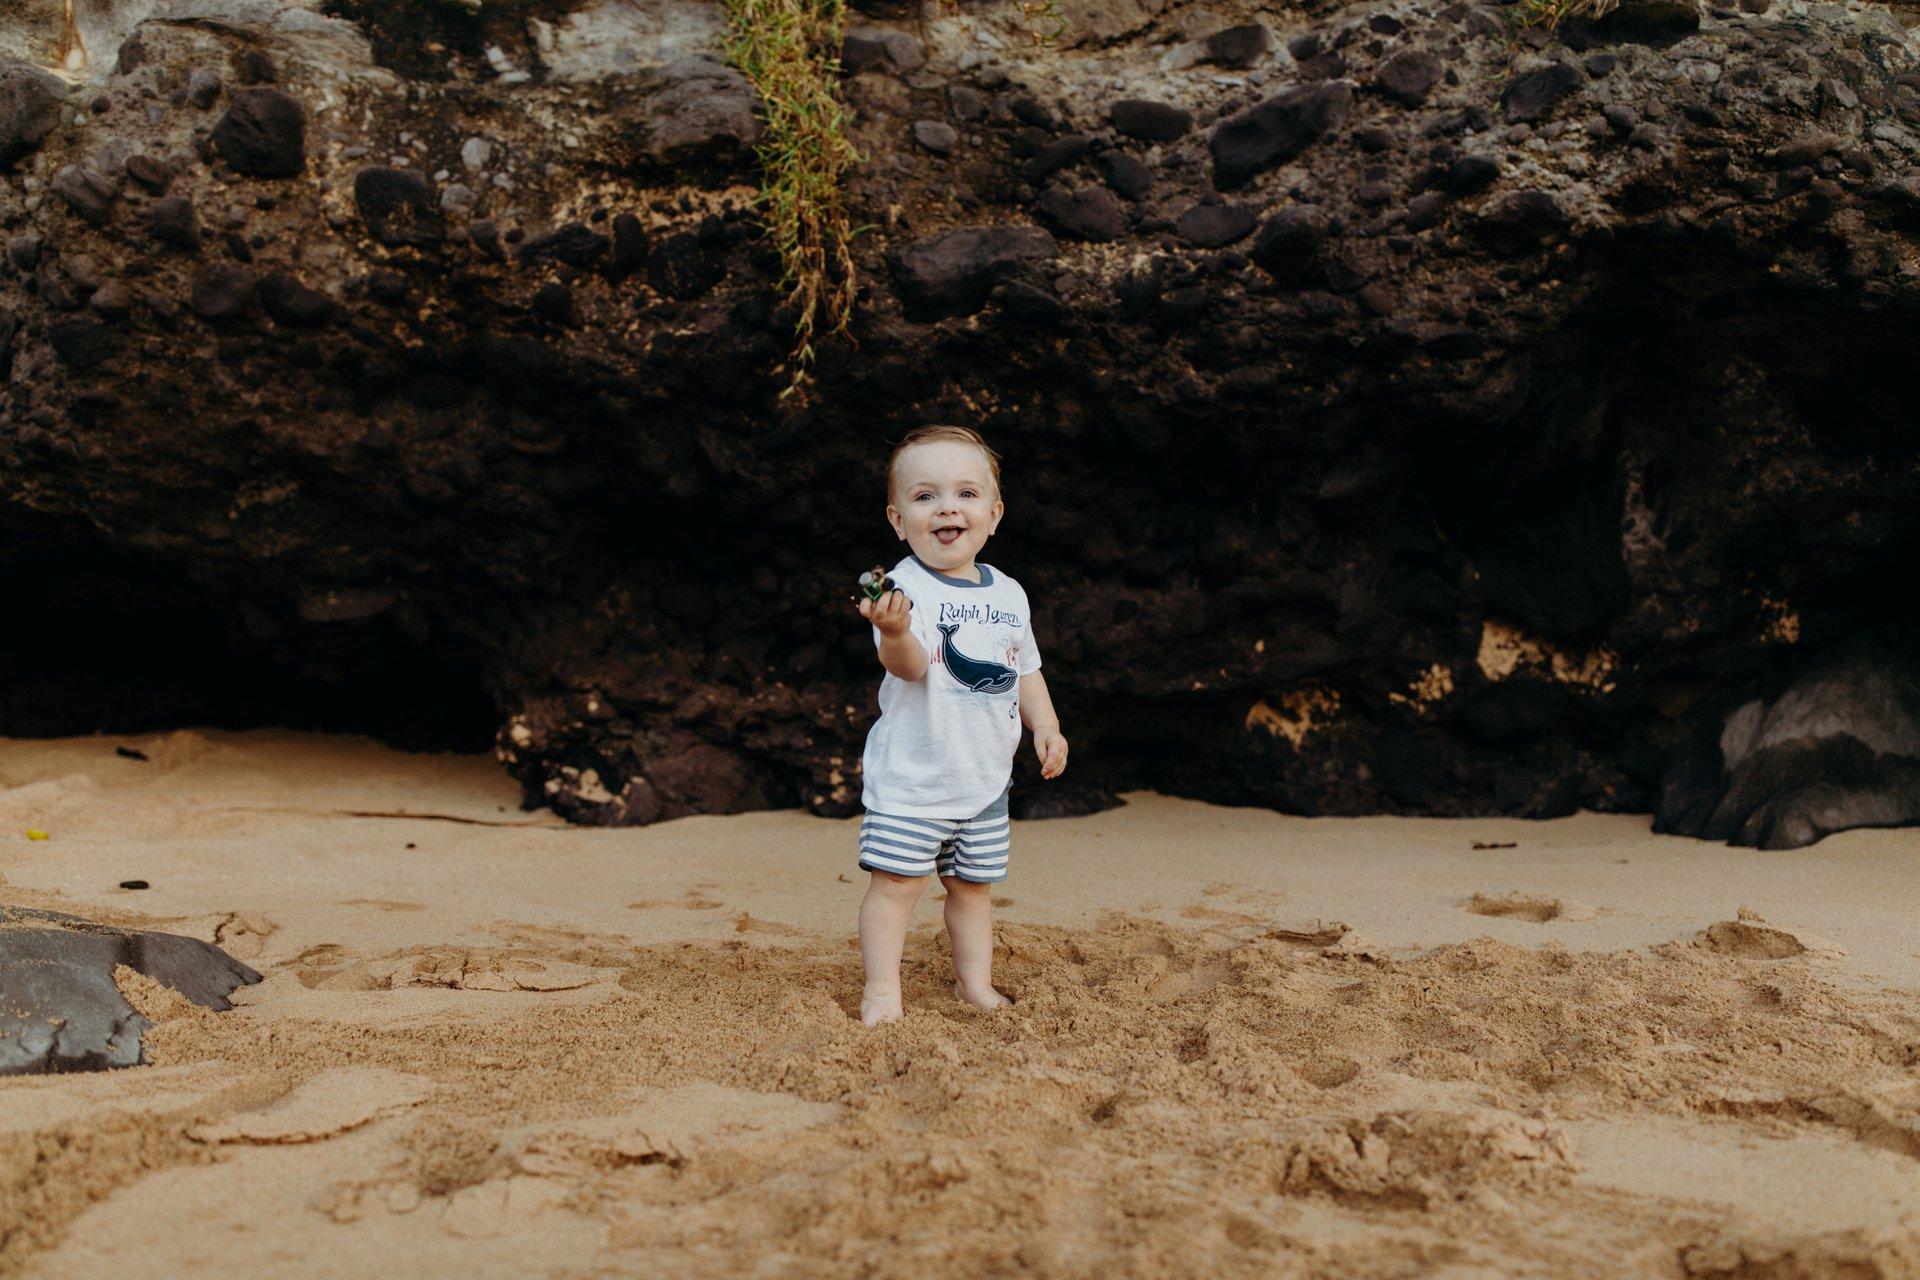 Maui-USA-travel-story-Flytographer-17